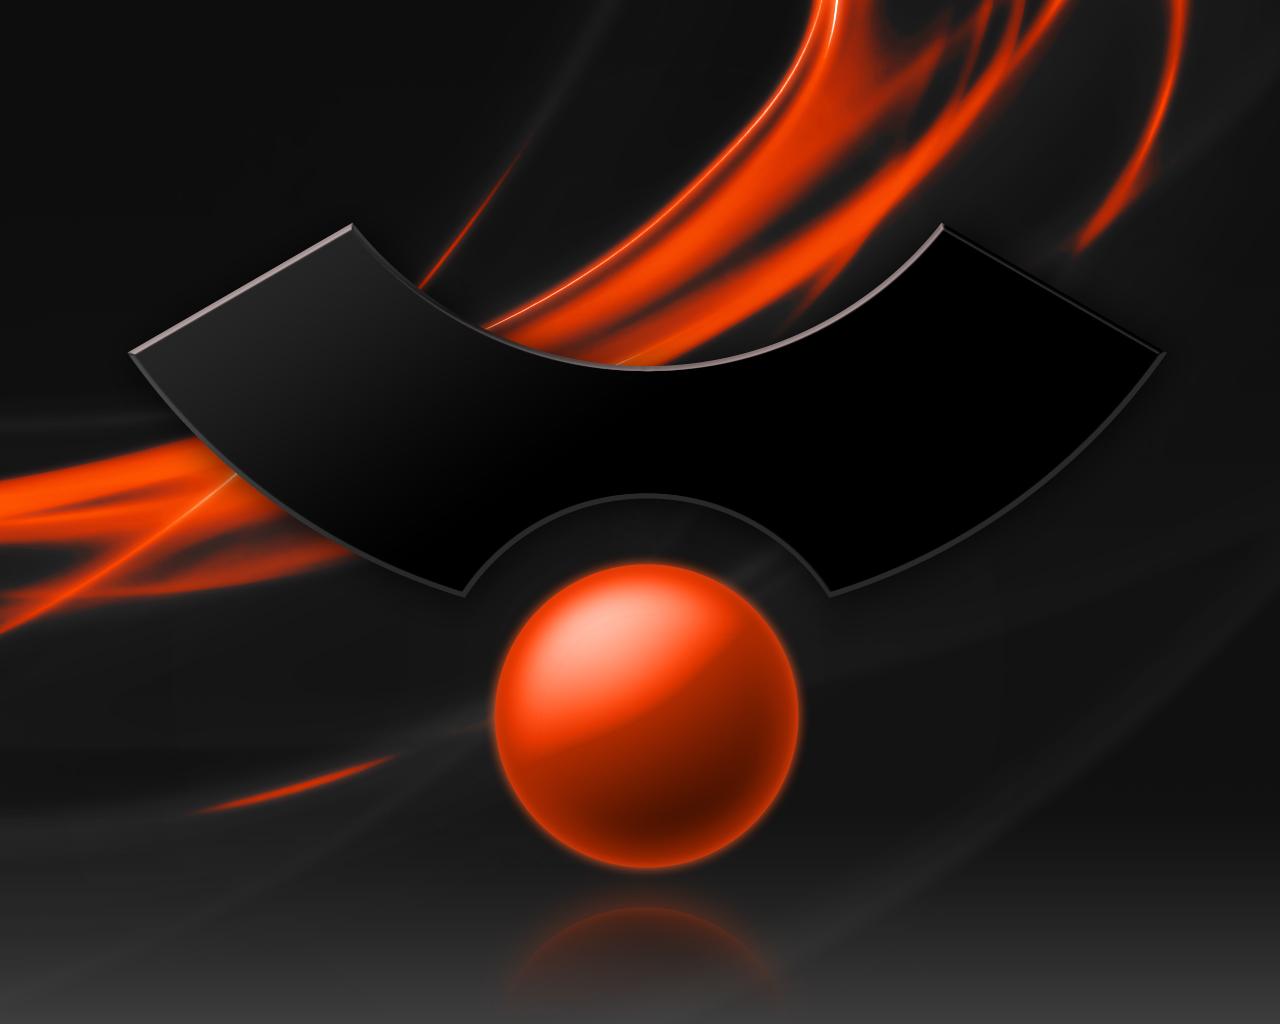 ubuntu wallpaper 1 1280x1024